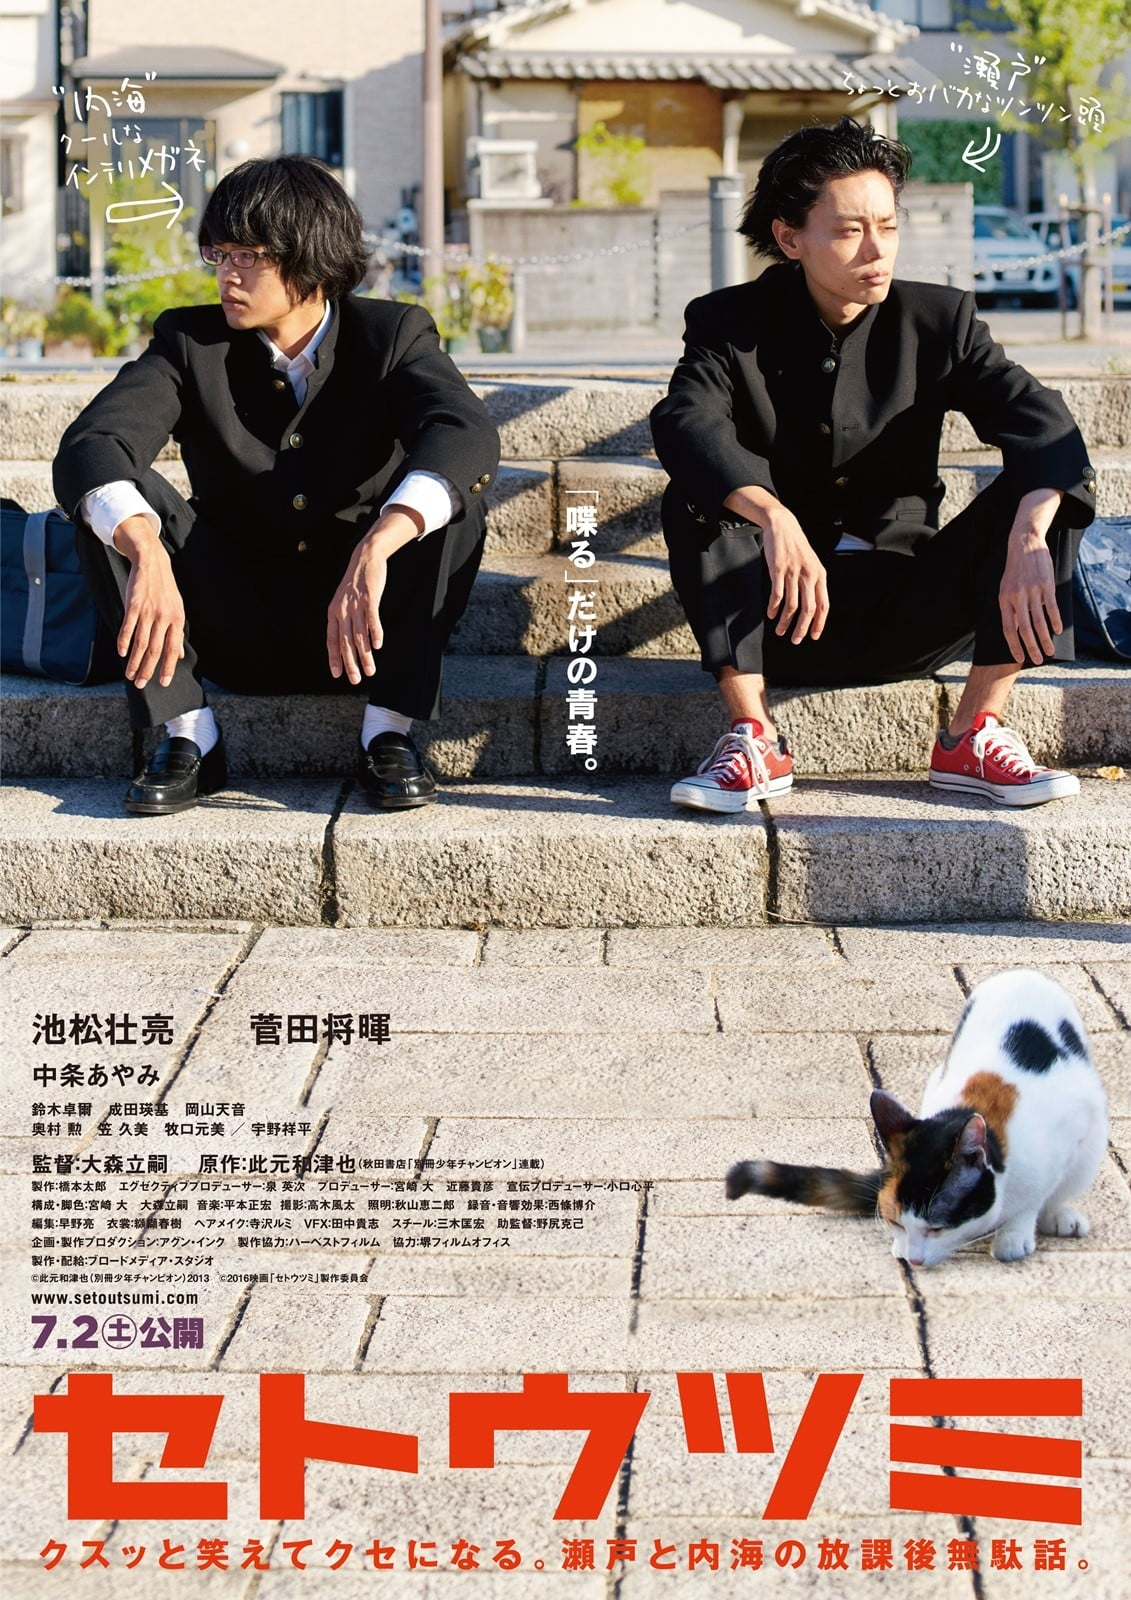 Seto and Utsumi